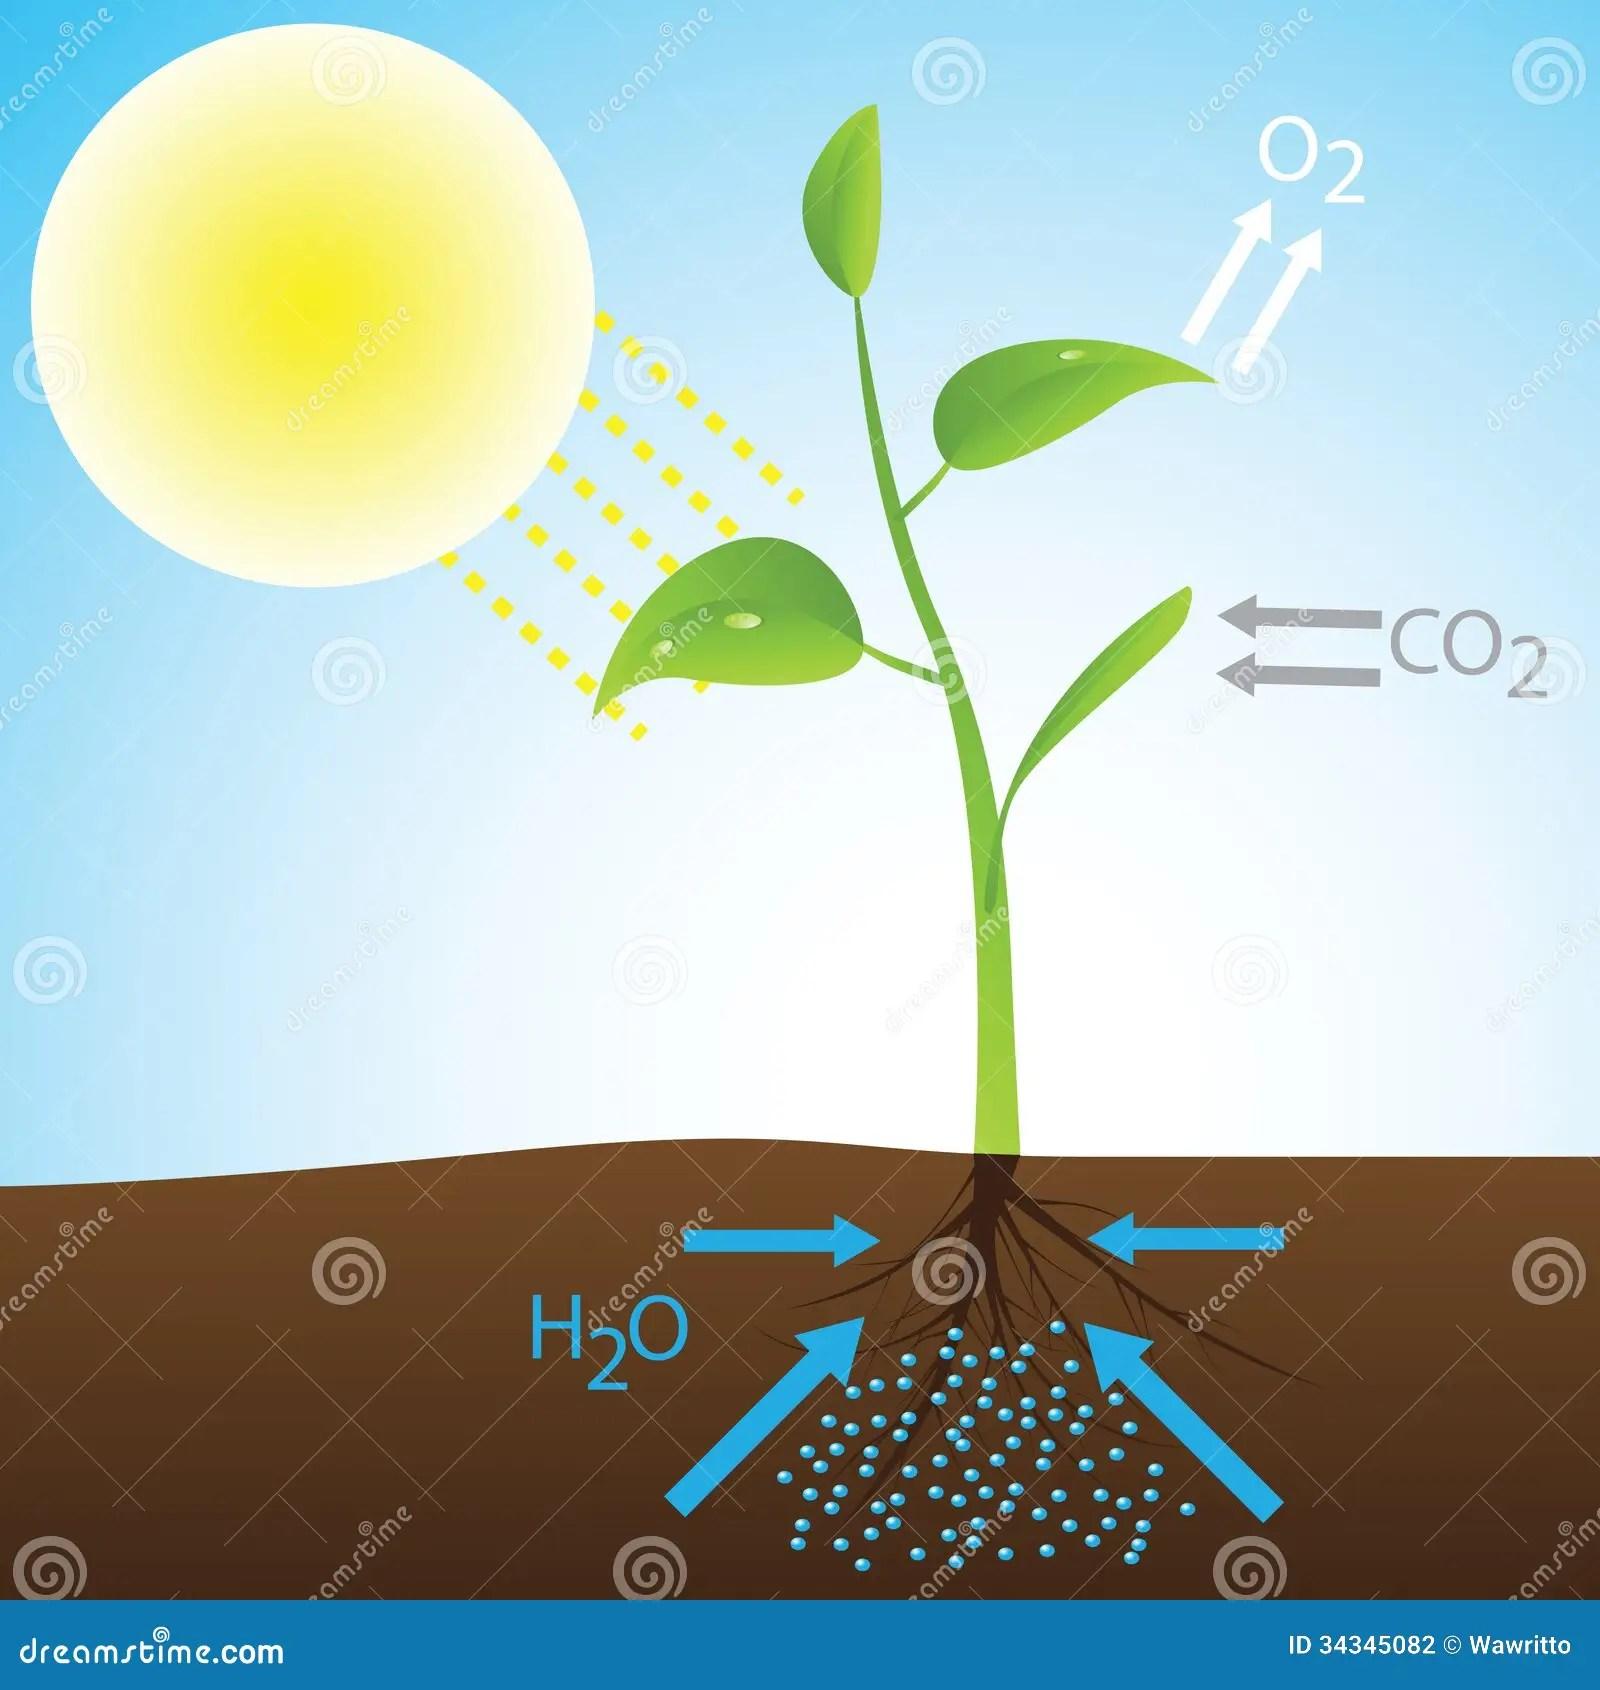 photosynthesis z scheme diagram 1976 bmw 2002 wiring of stock vector illustration